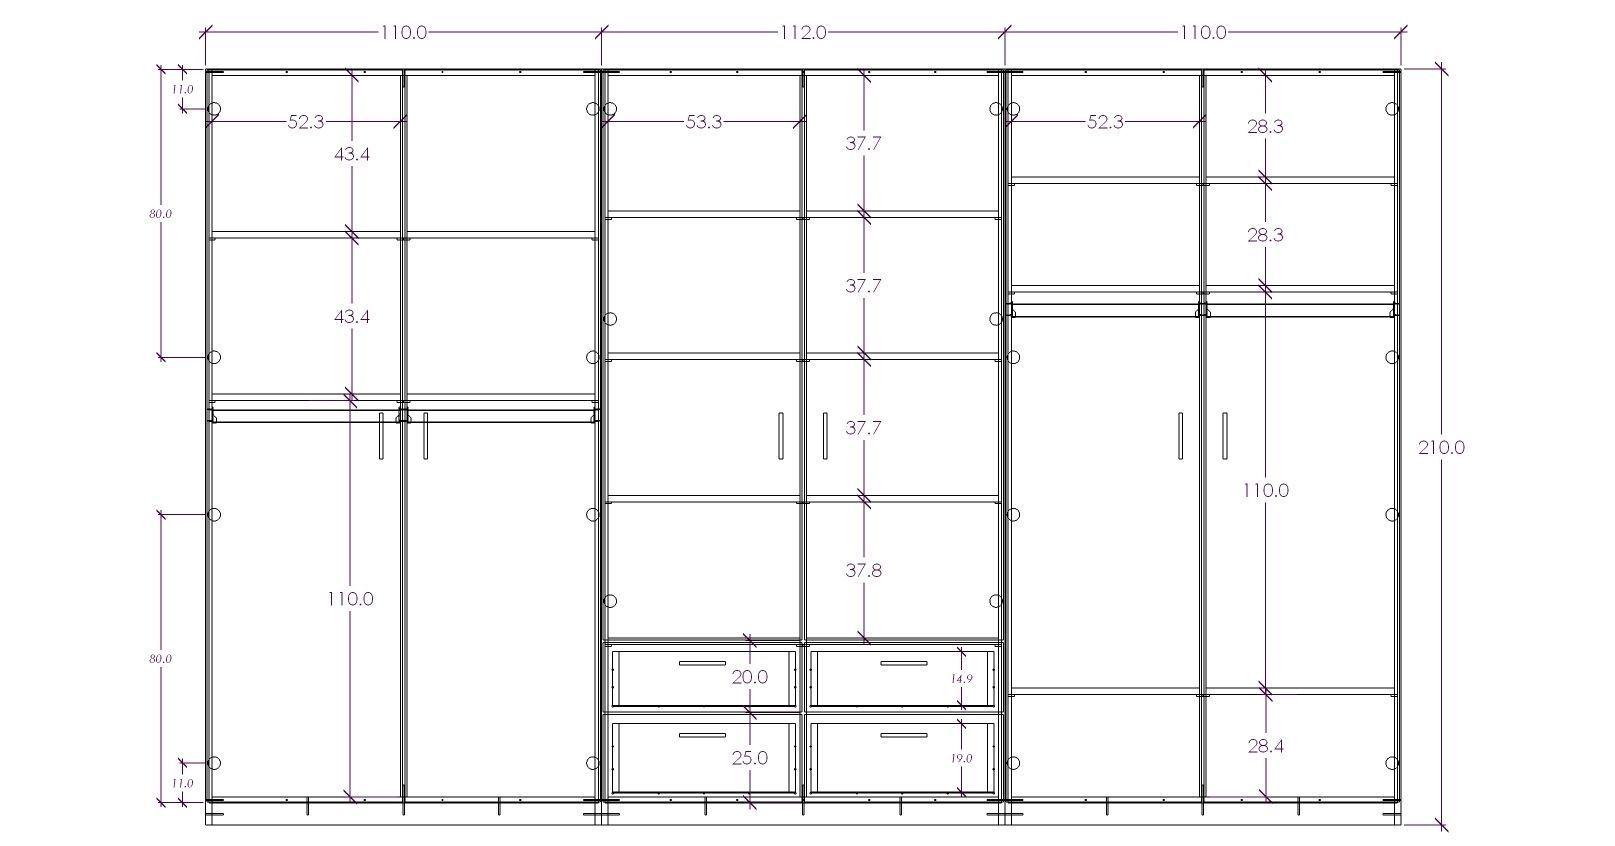 Free Sketchup 3d Models | Wiring Diagram Database